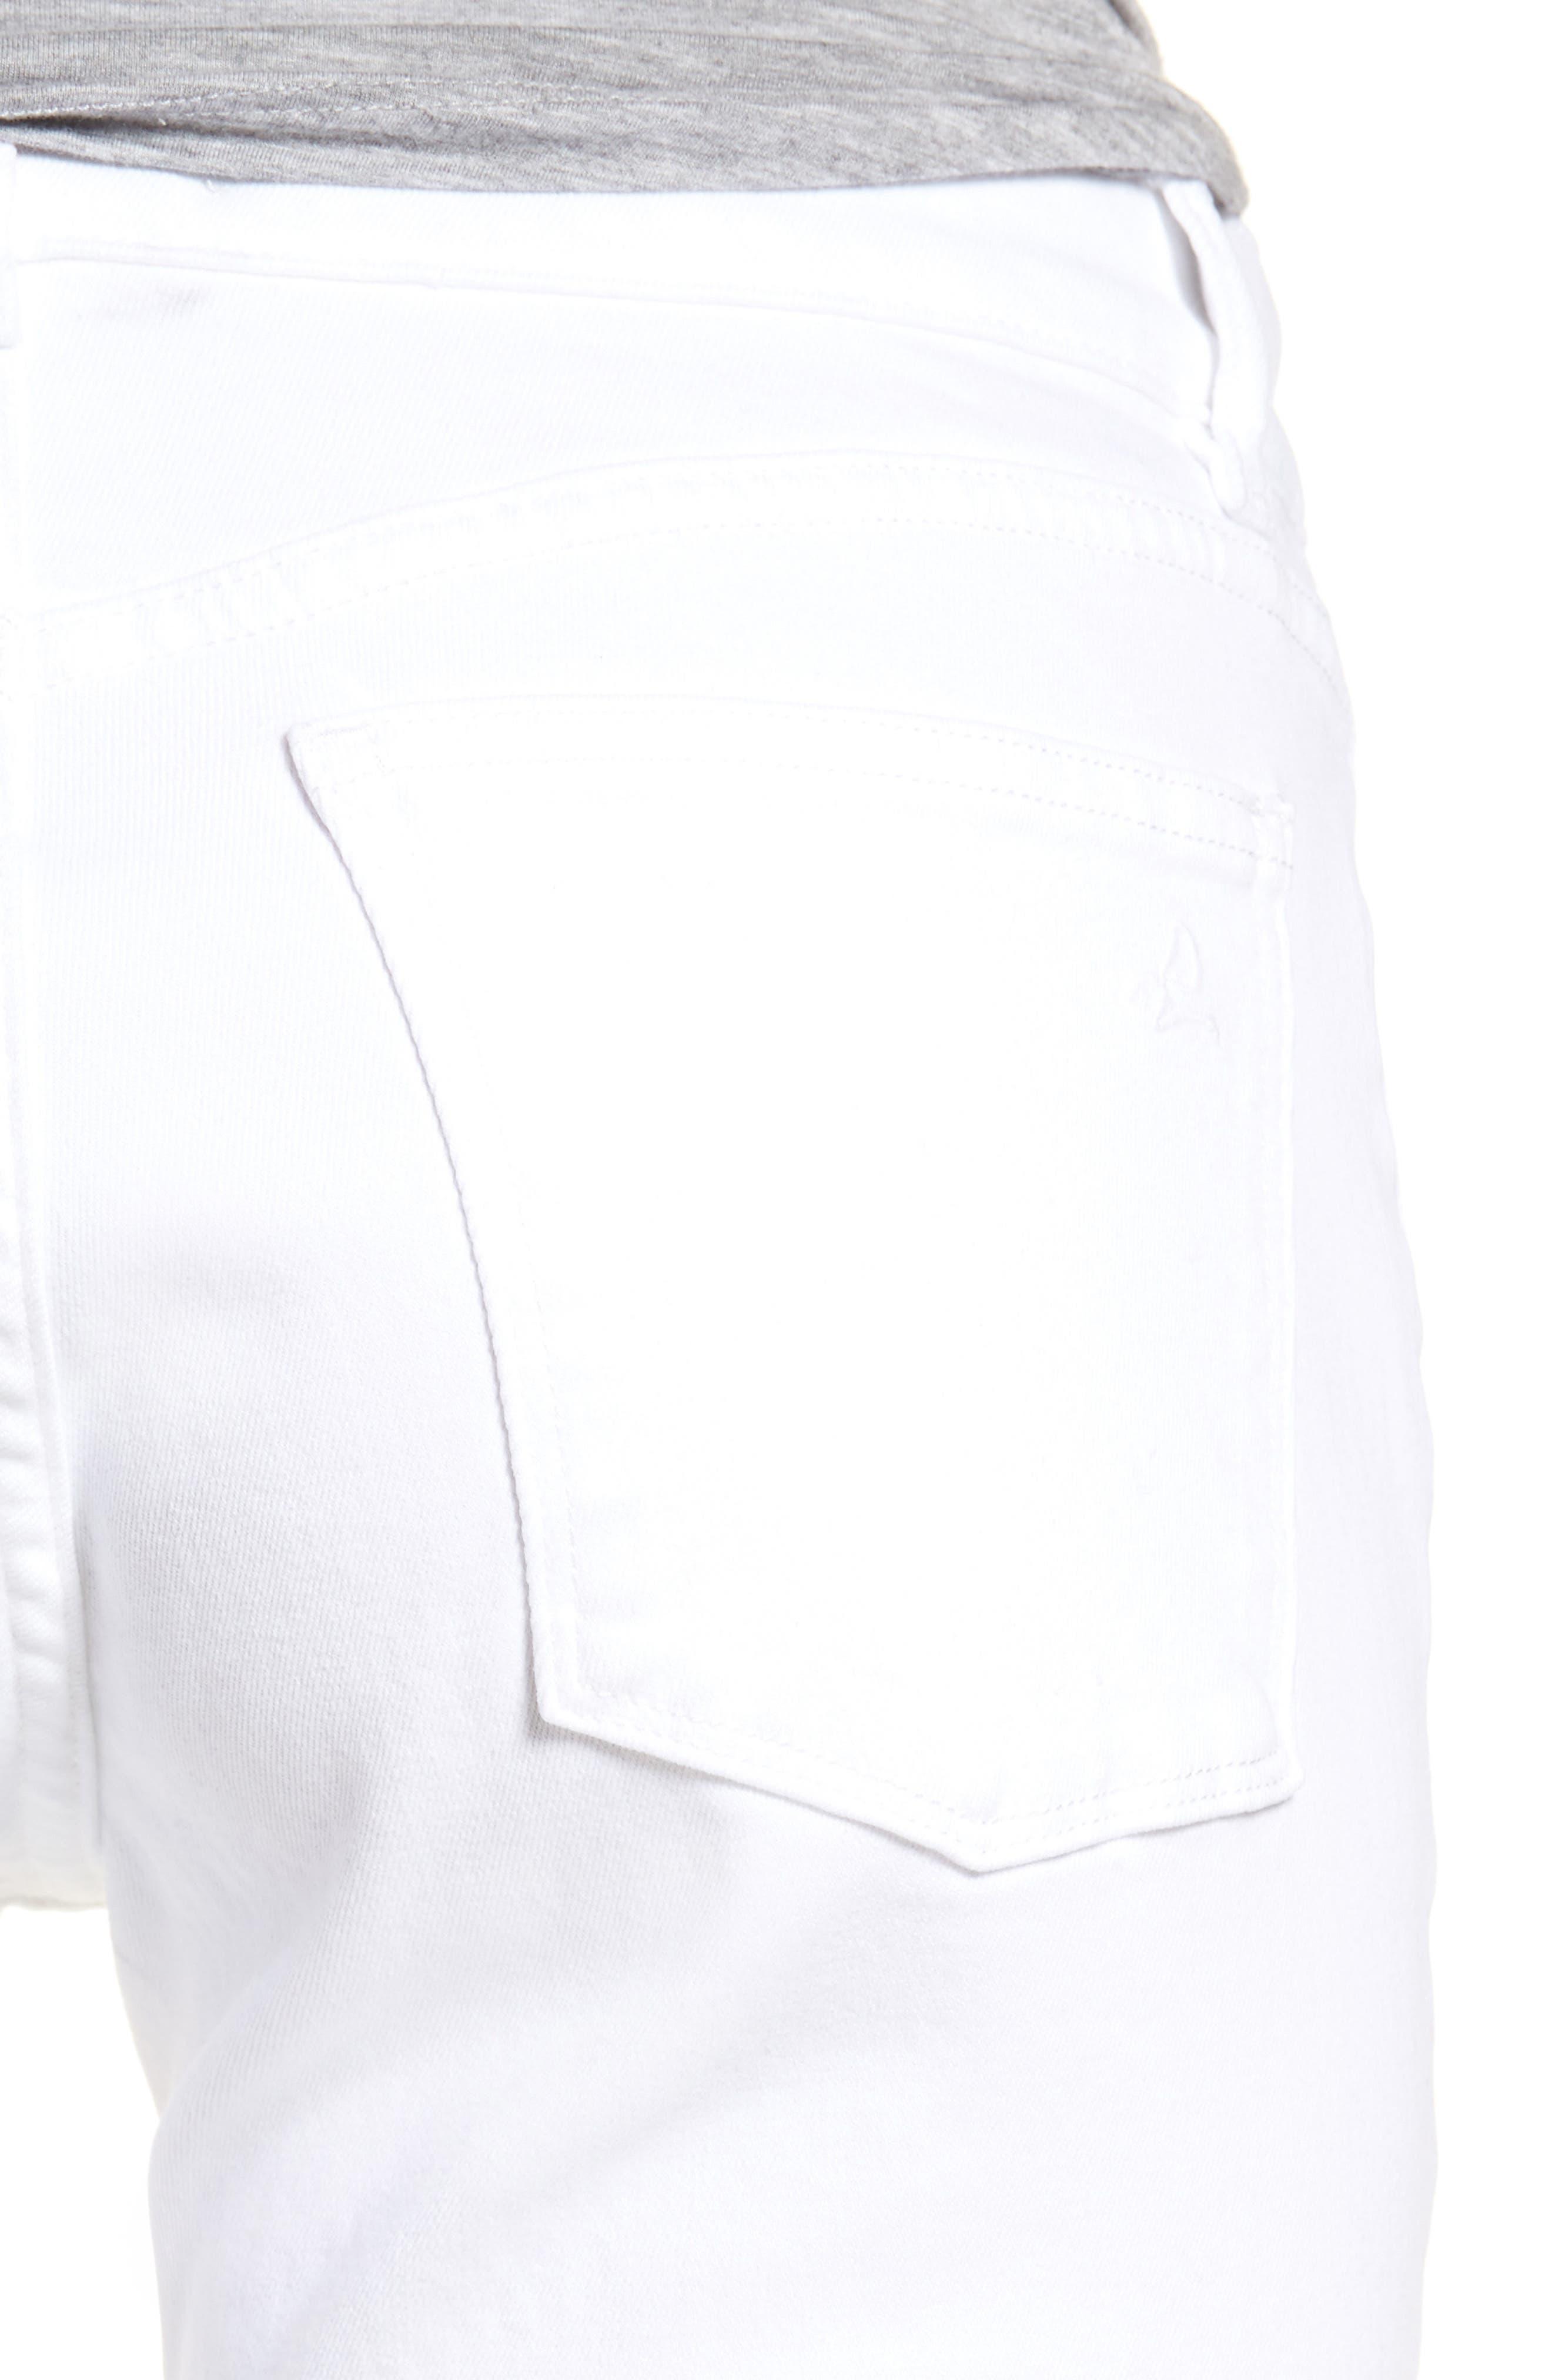 Florence Skinny Jeans,                             Alternate thumbnail 4, color,                             Porcelain